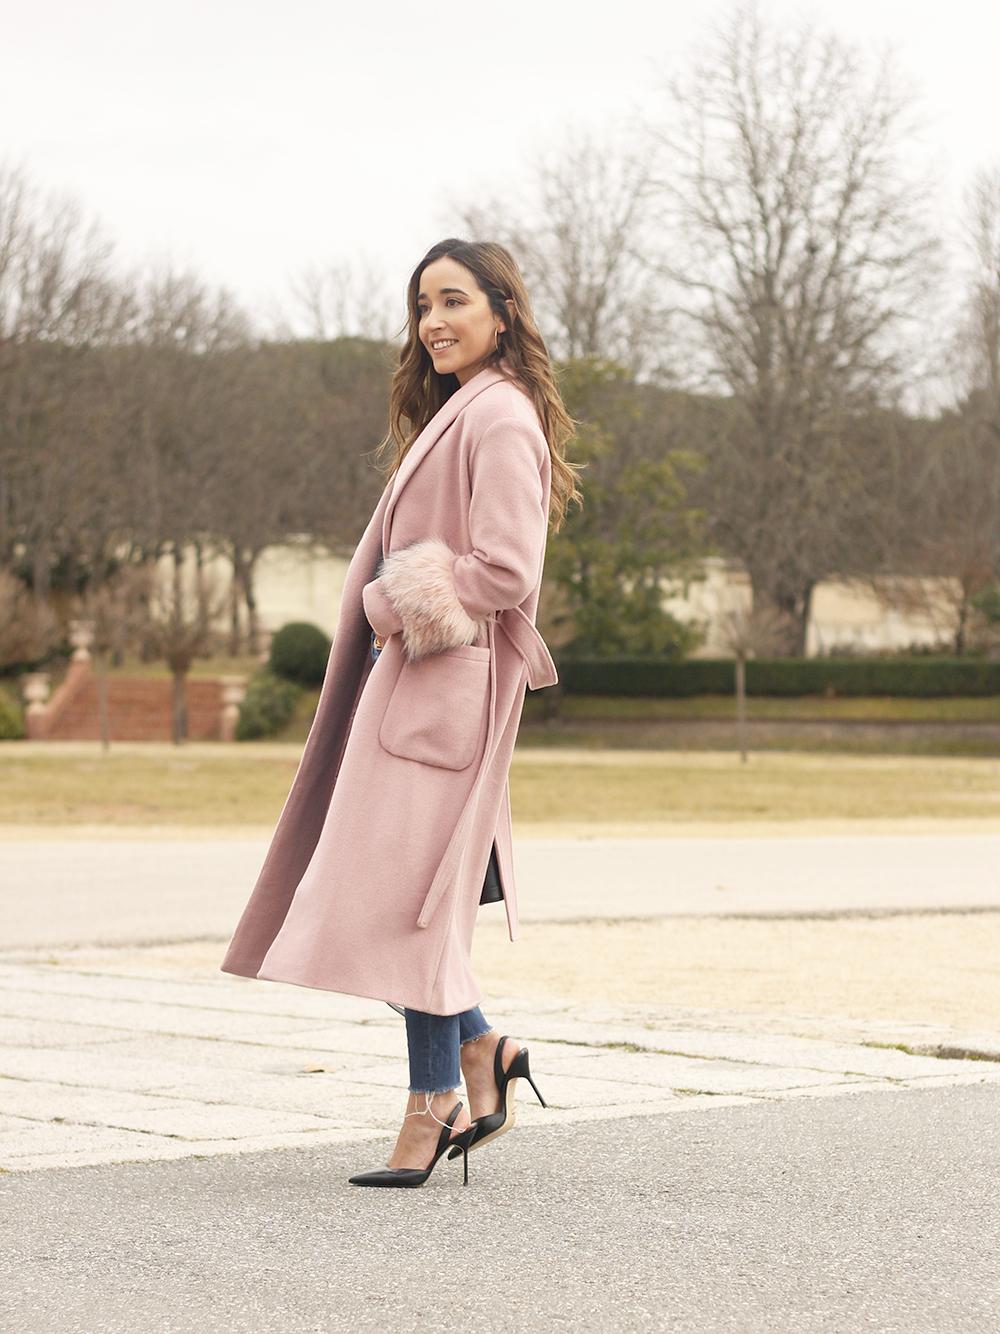 pink coat byleclair carolina herrera heels jeans louis vuitton ba street style outfit 20196